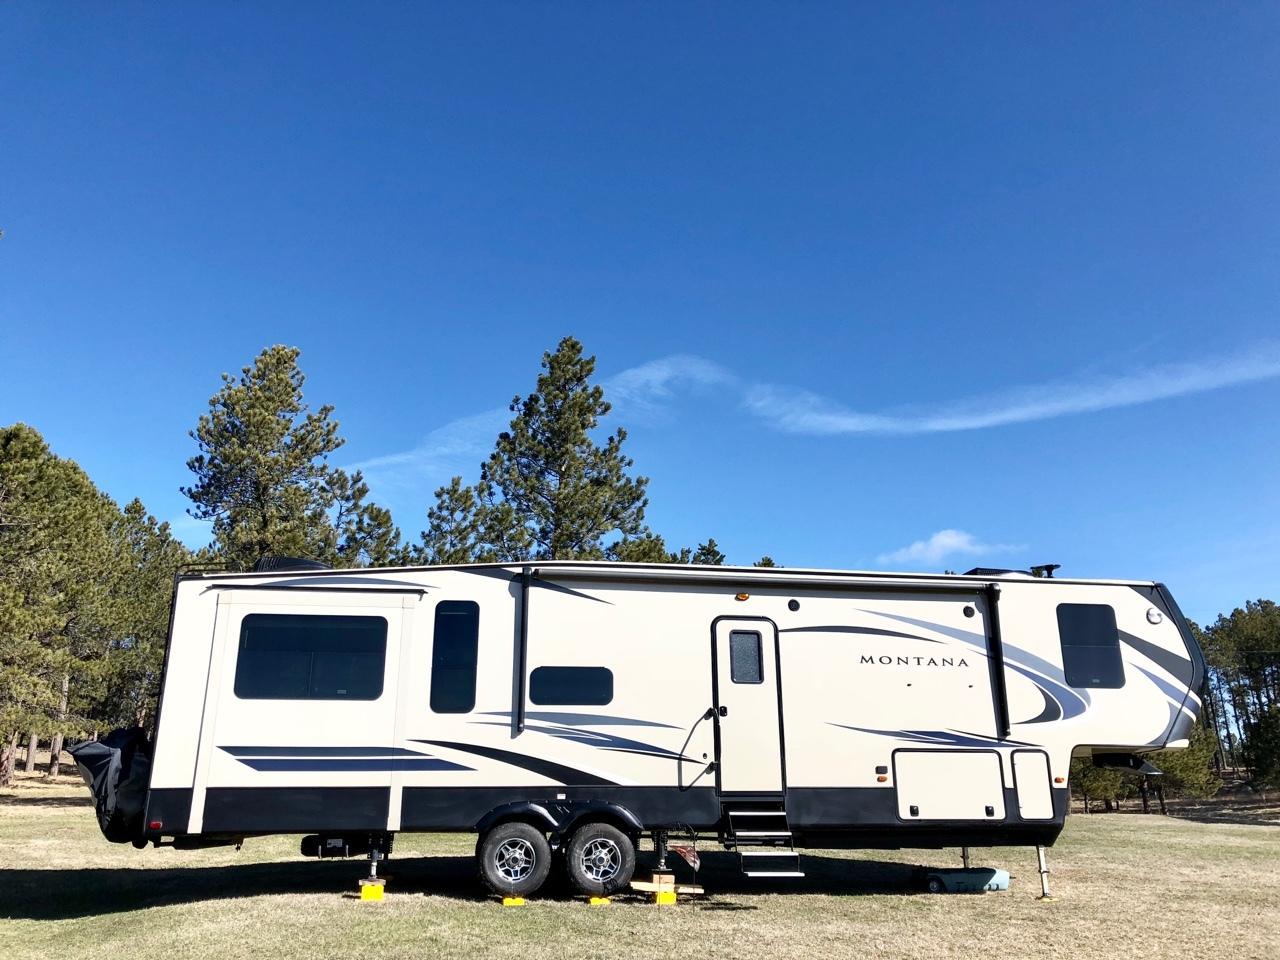 Idaho Rvs For Sale 4385 Near Me Rv Trader Fleetwood Motorhome Battery Wiring Diagram